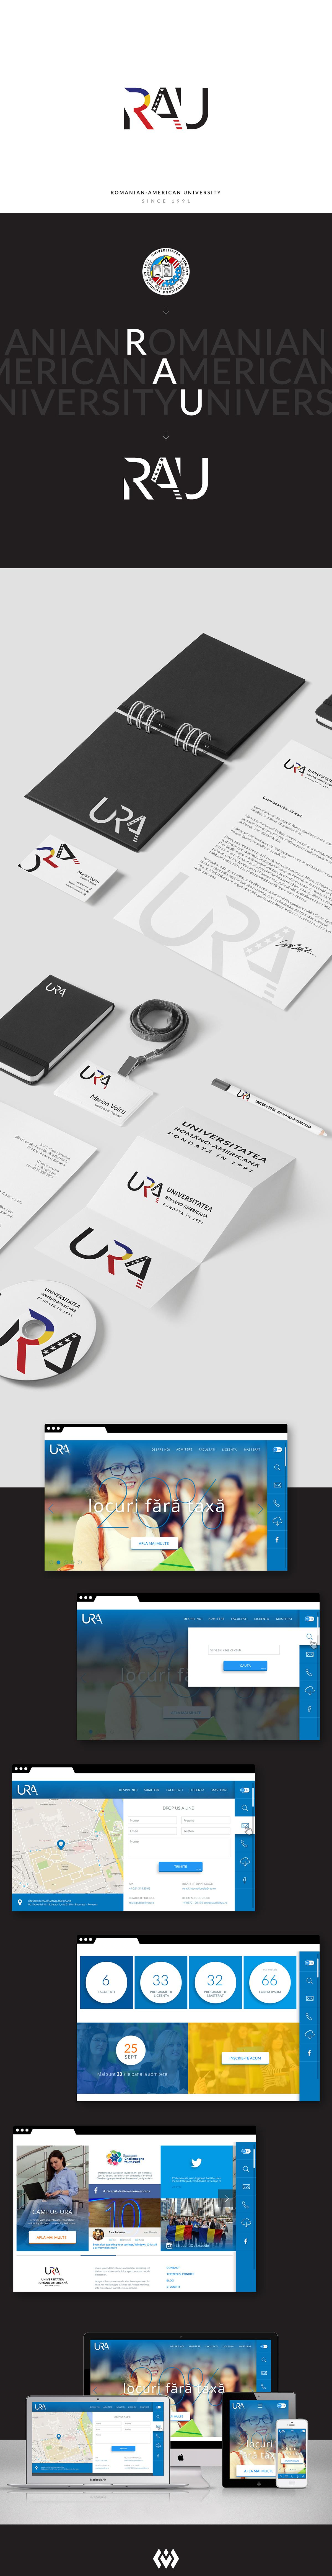 rebranding,logo,ux,UI,Web,design,Webdesign,Responsive,rau,University,romania,america,inspiration